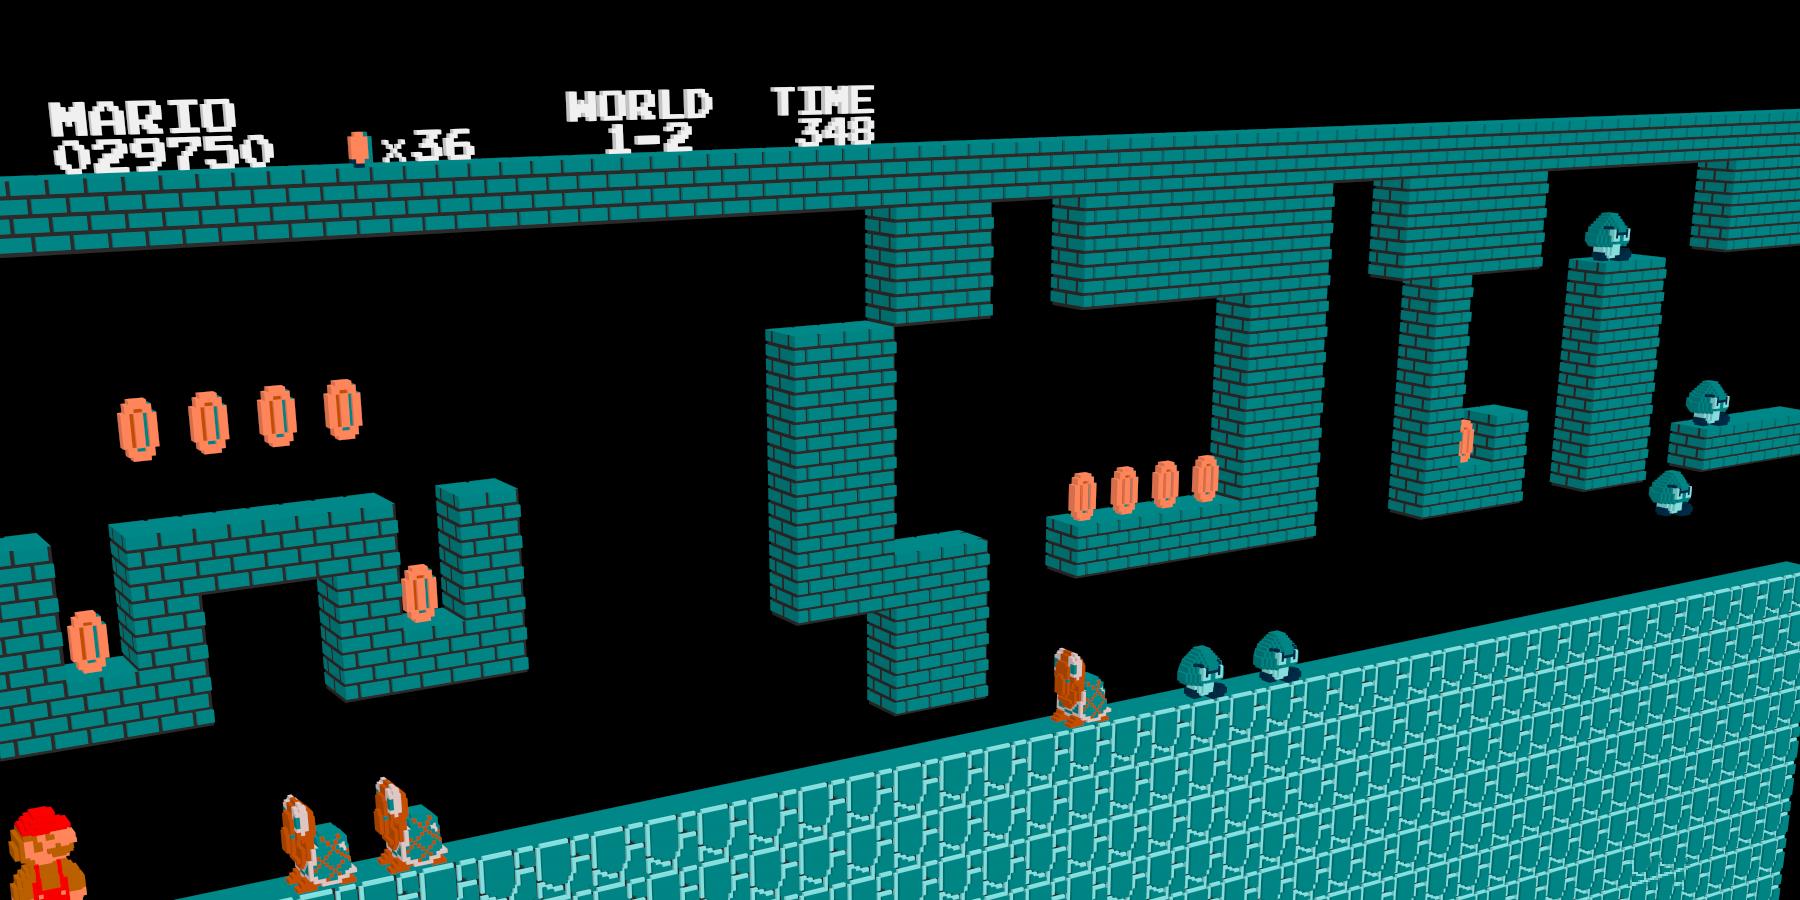 Все заставки NES «Press Start» в одном видео